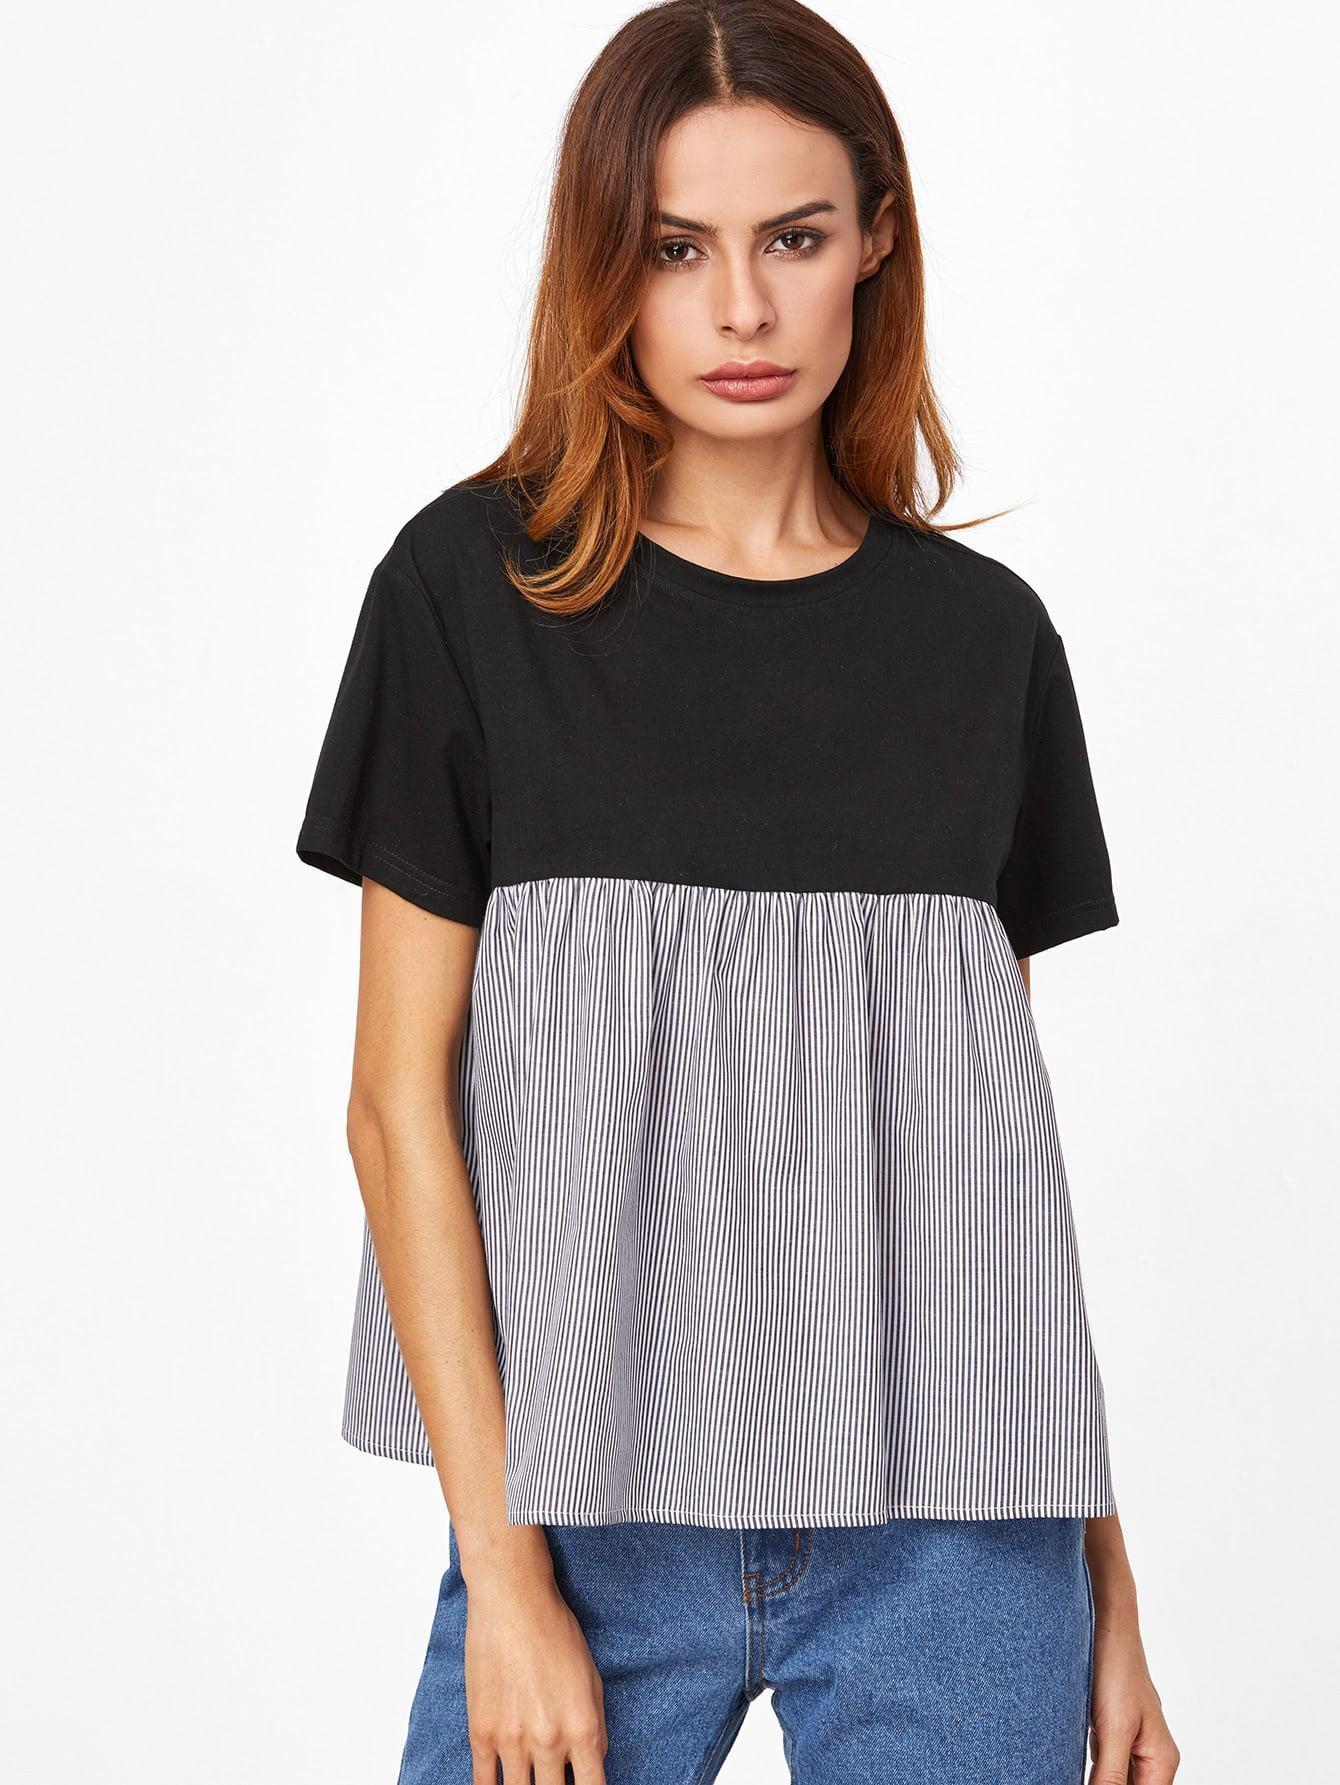 Contrast Striped Trim Babydoll T-shirt tee161118712